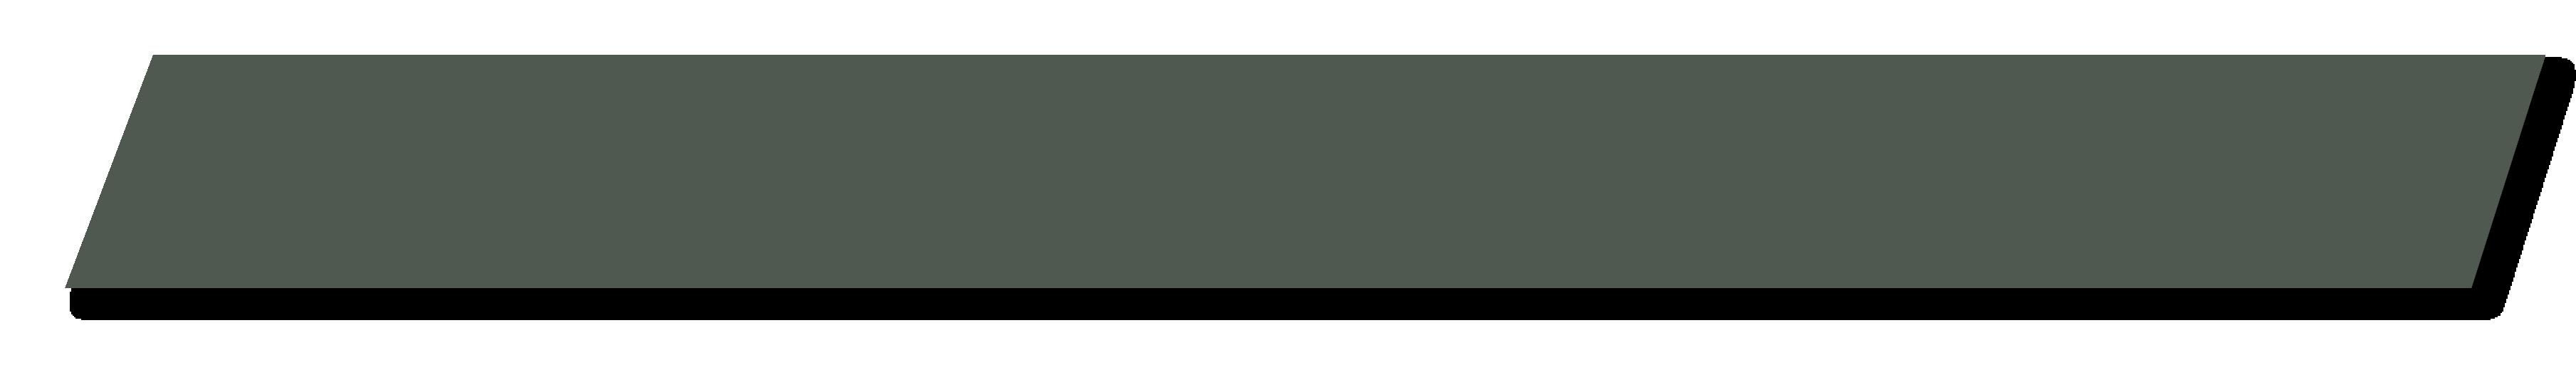 GL Tavaszindito banner polygon zold 1